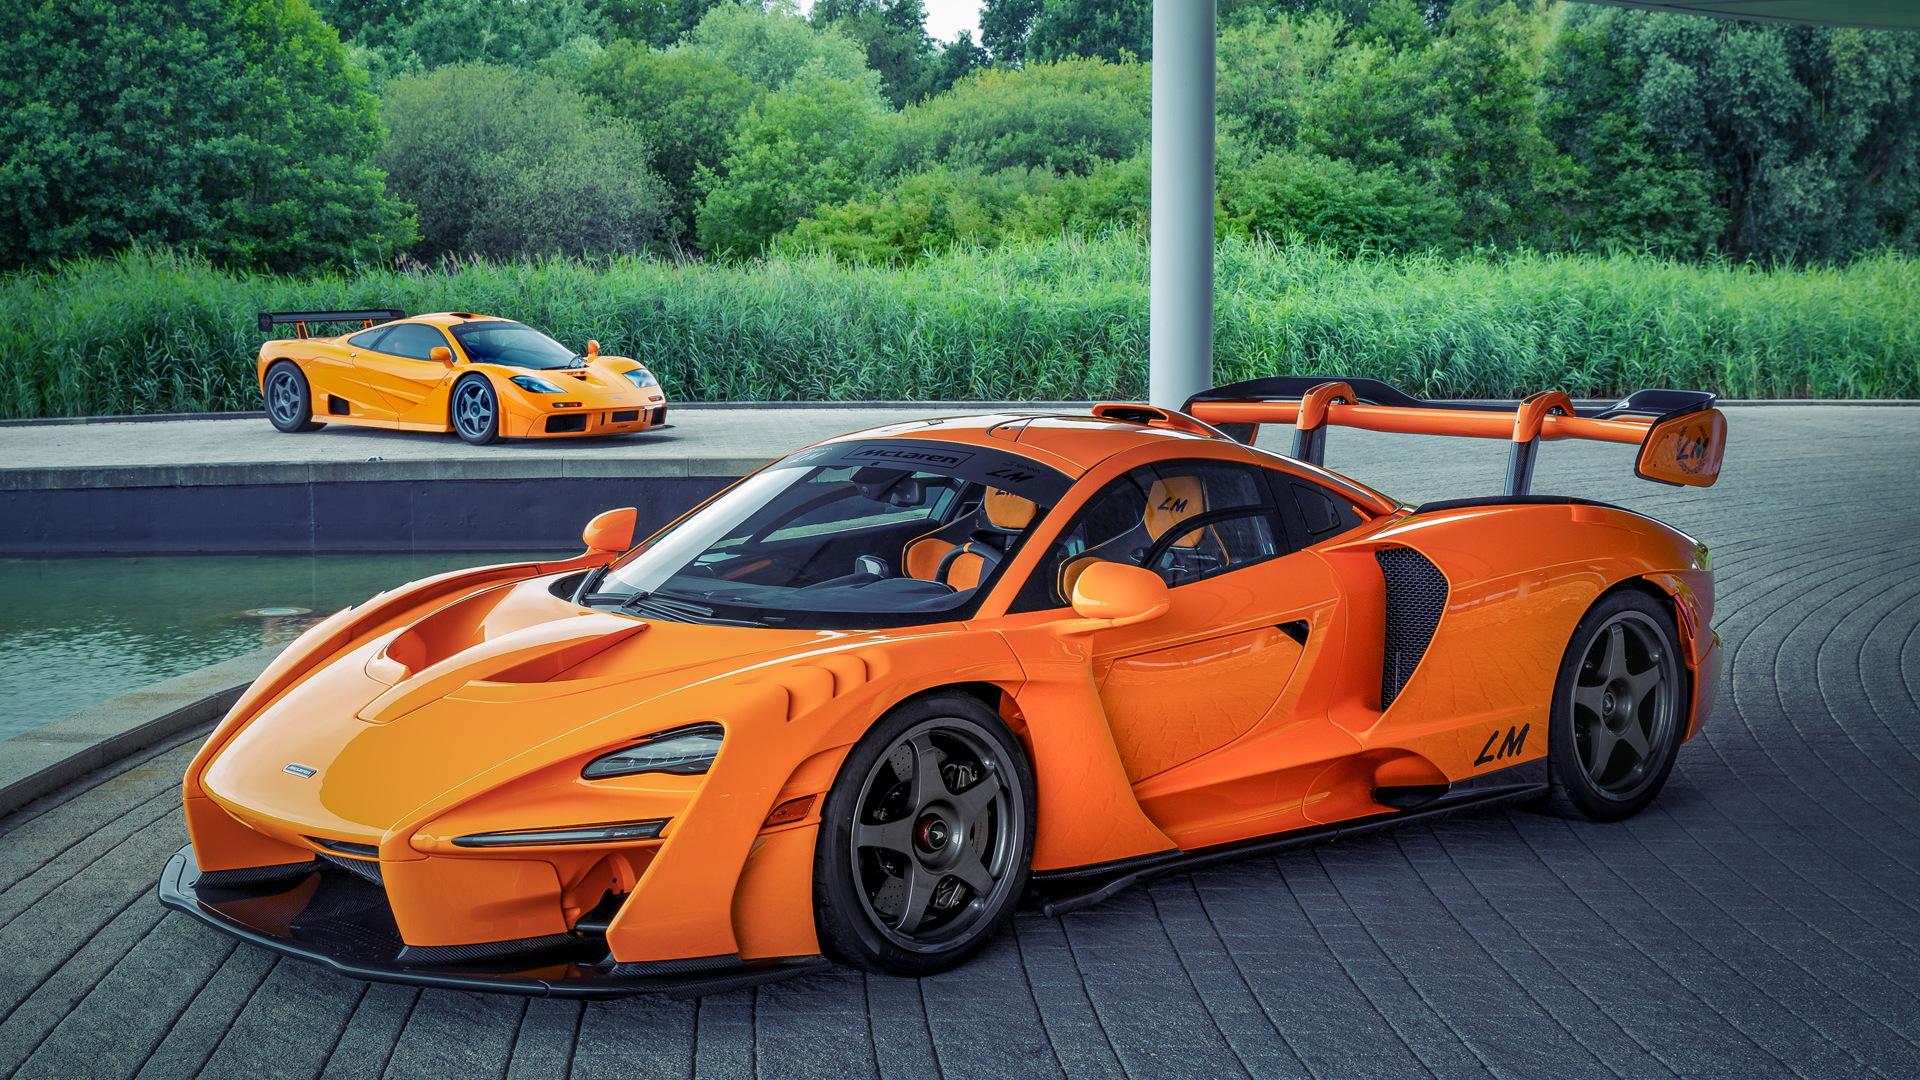 McLaren F1 LM and Senna LM